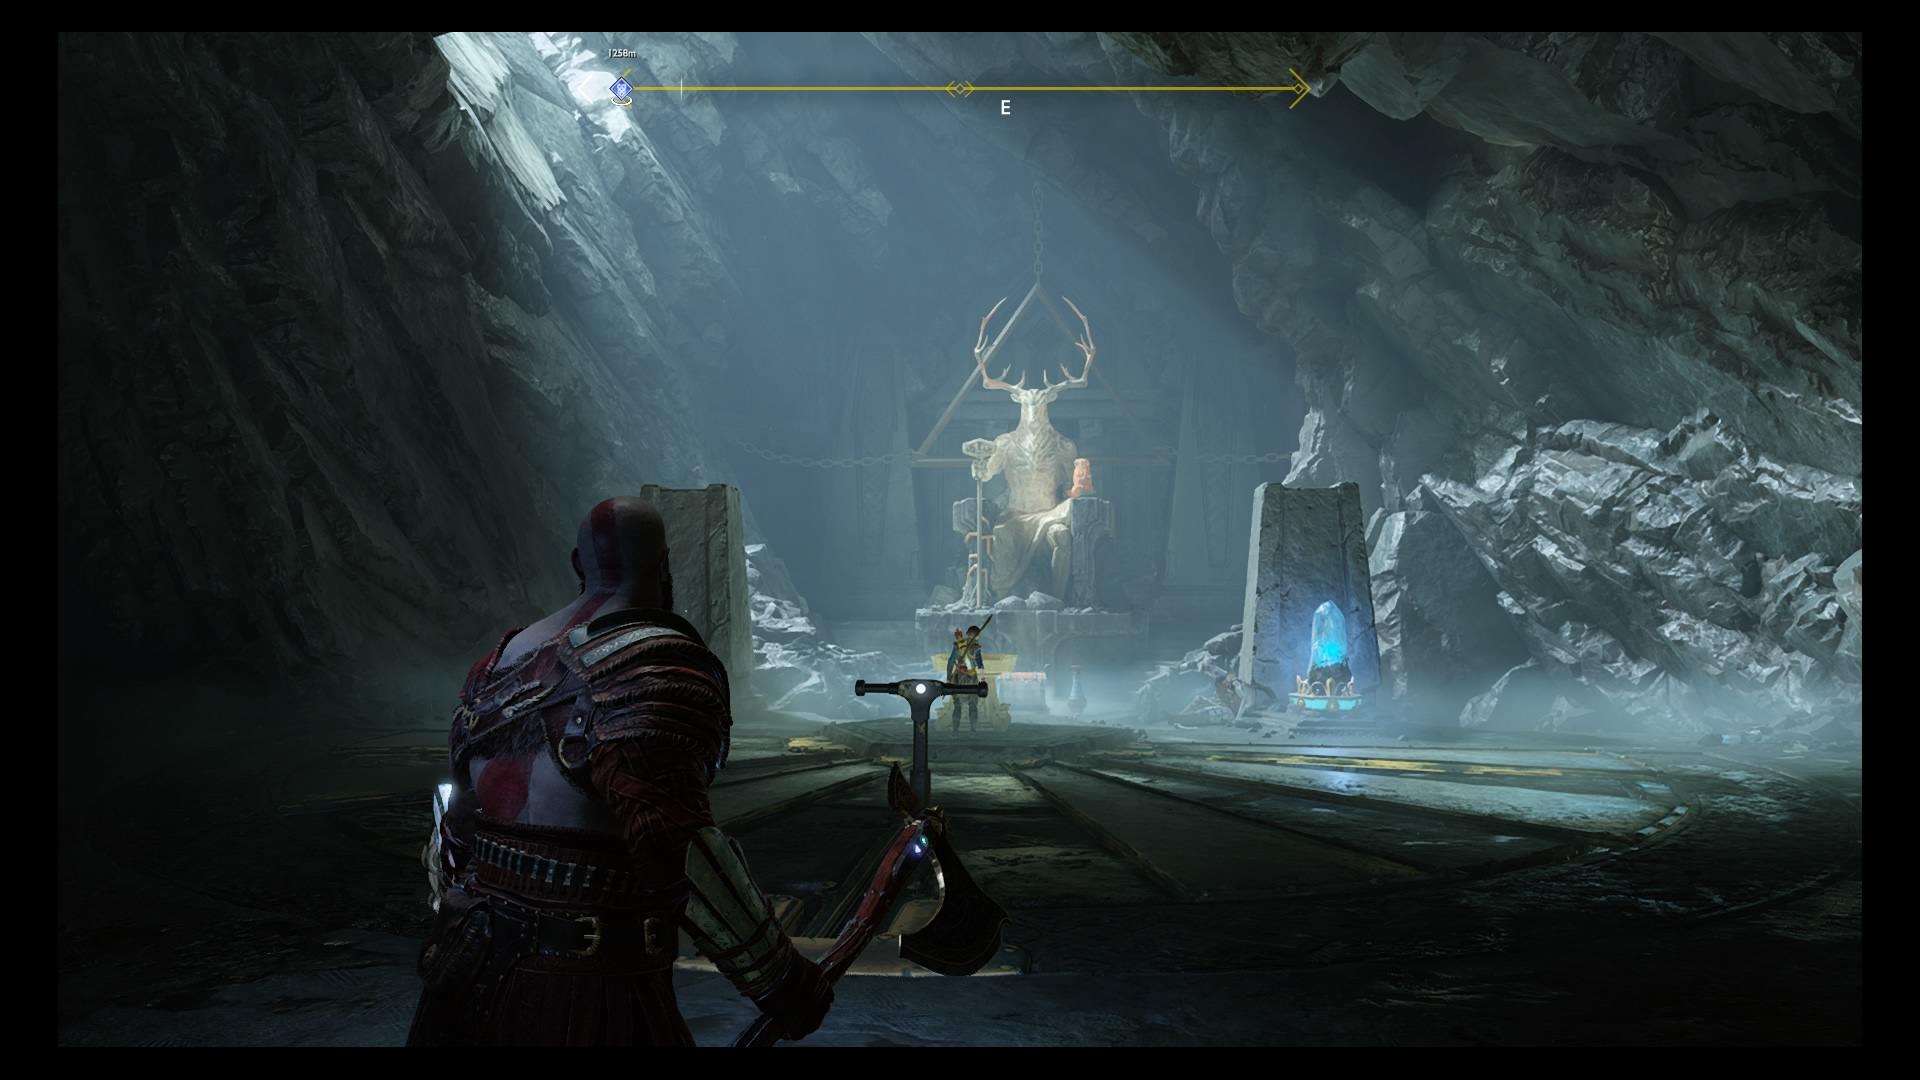 God of War Inside the Mountain quest: Deer Head Statue, Heart of the